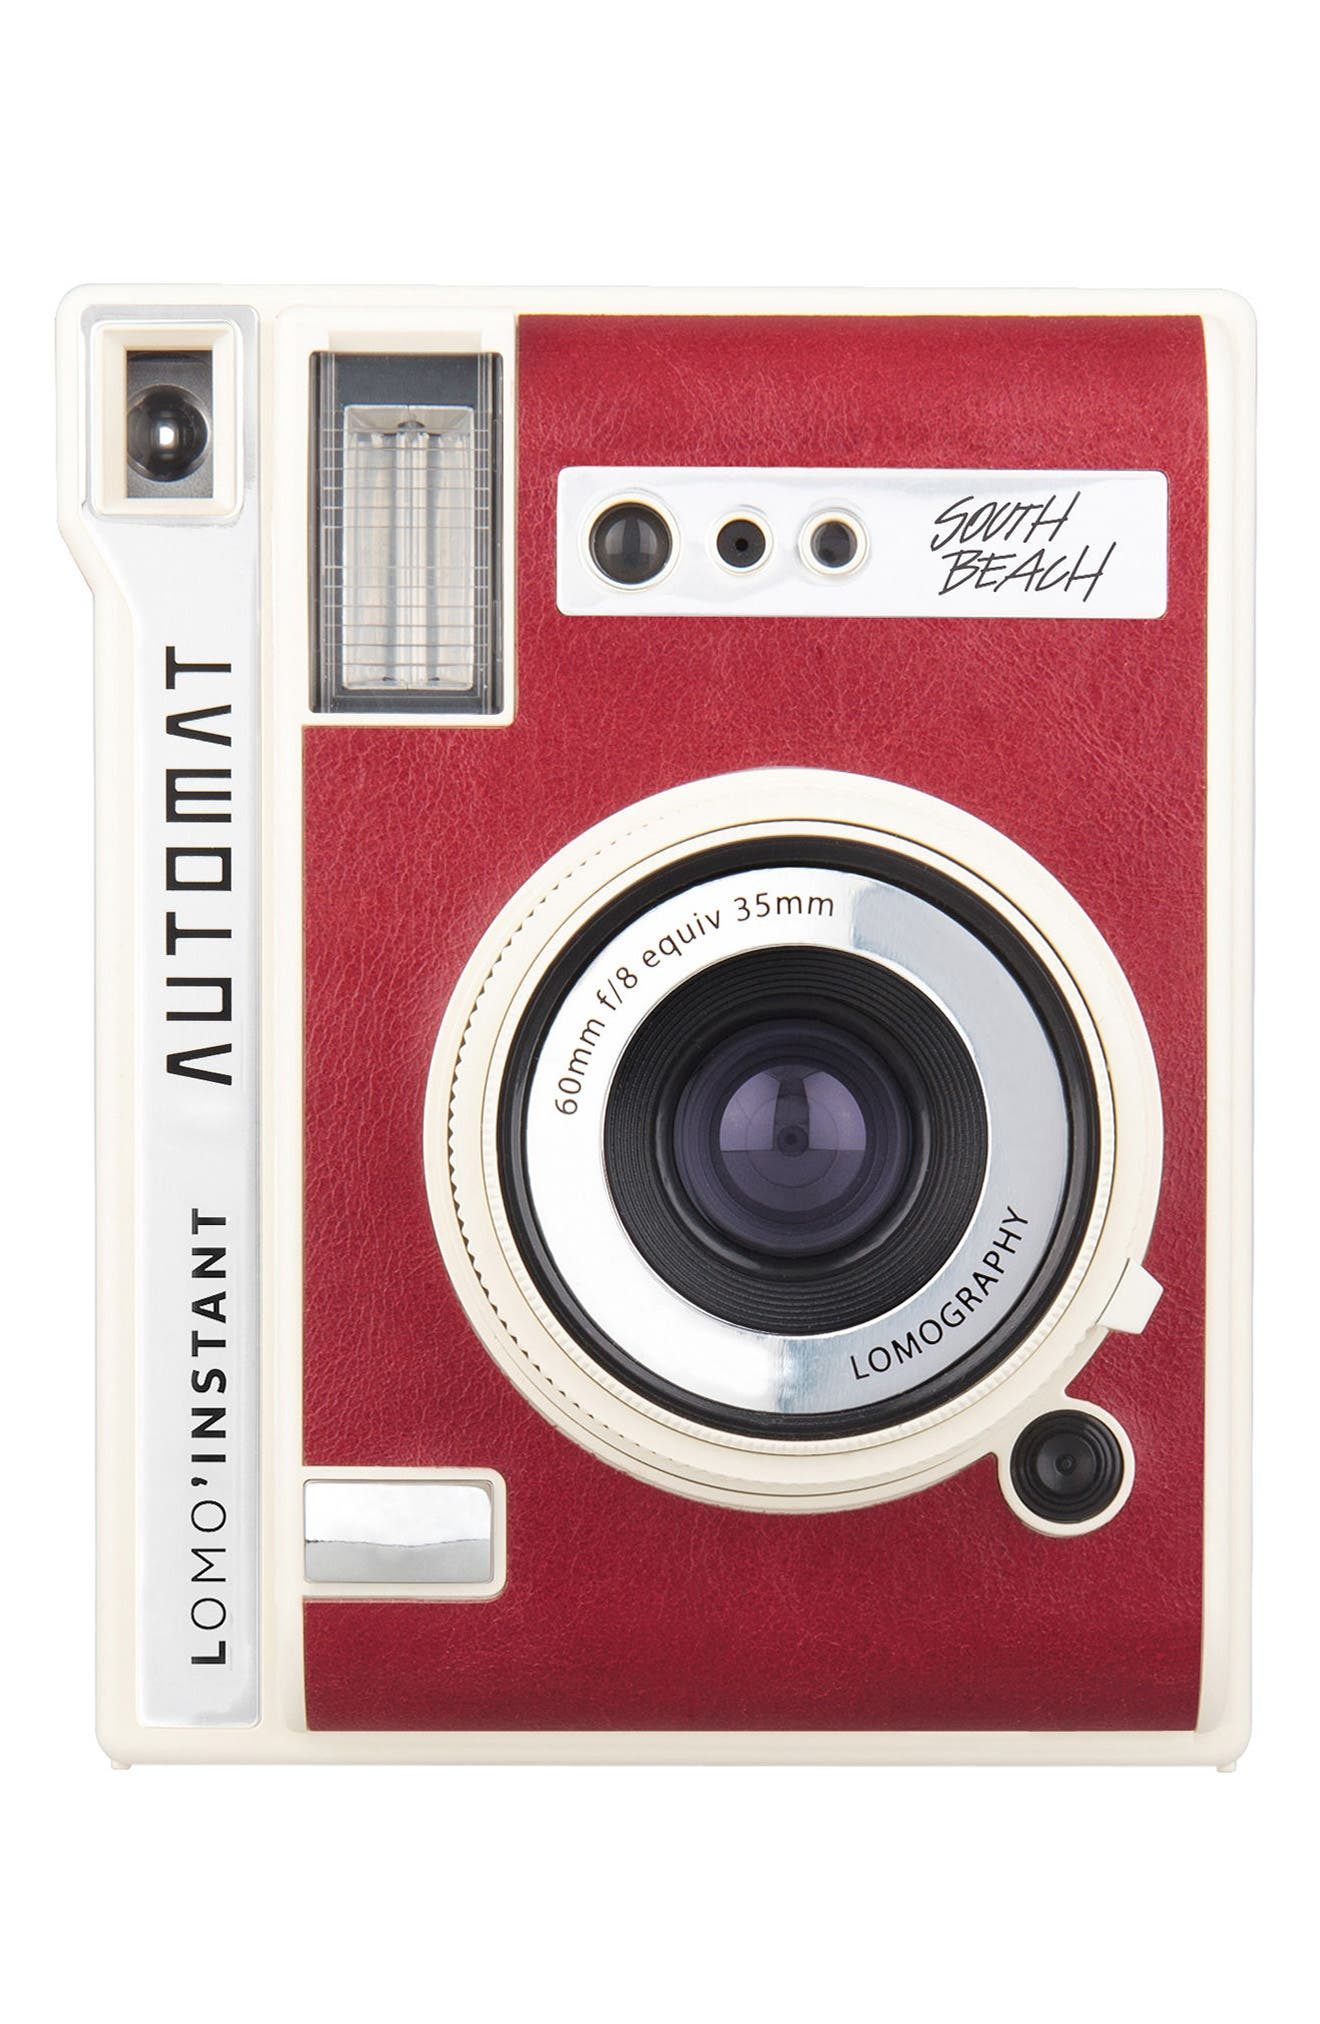 Lomography Lomo'Instant Automat South Beach Instant Camera